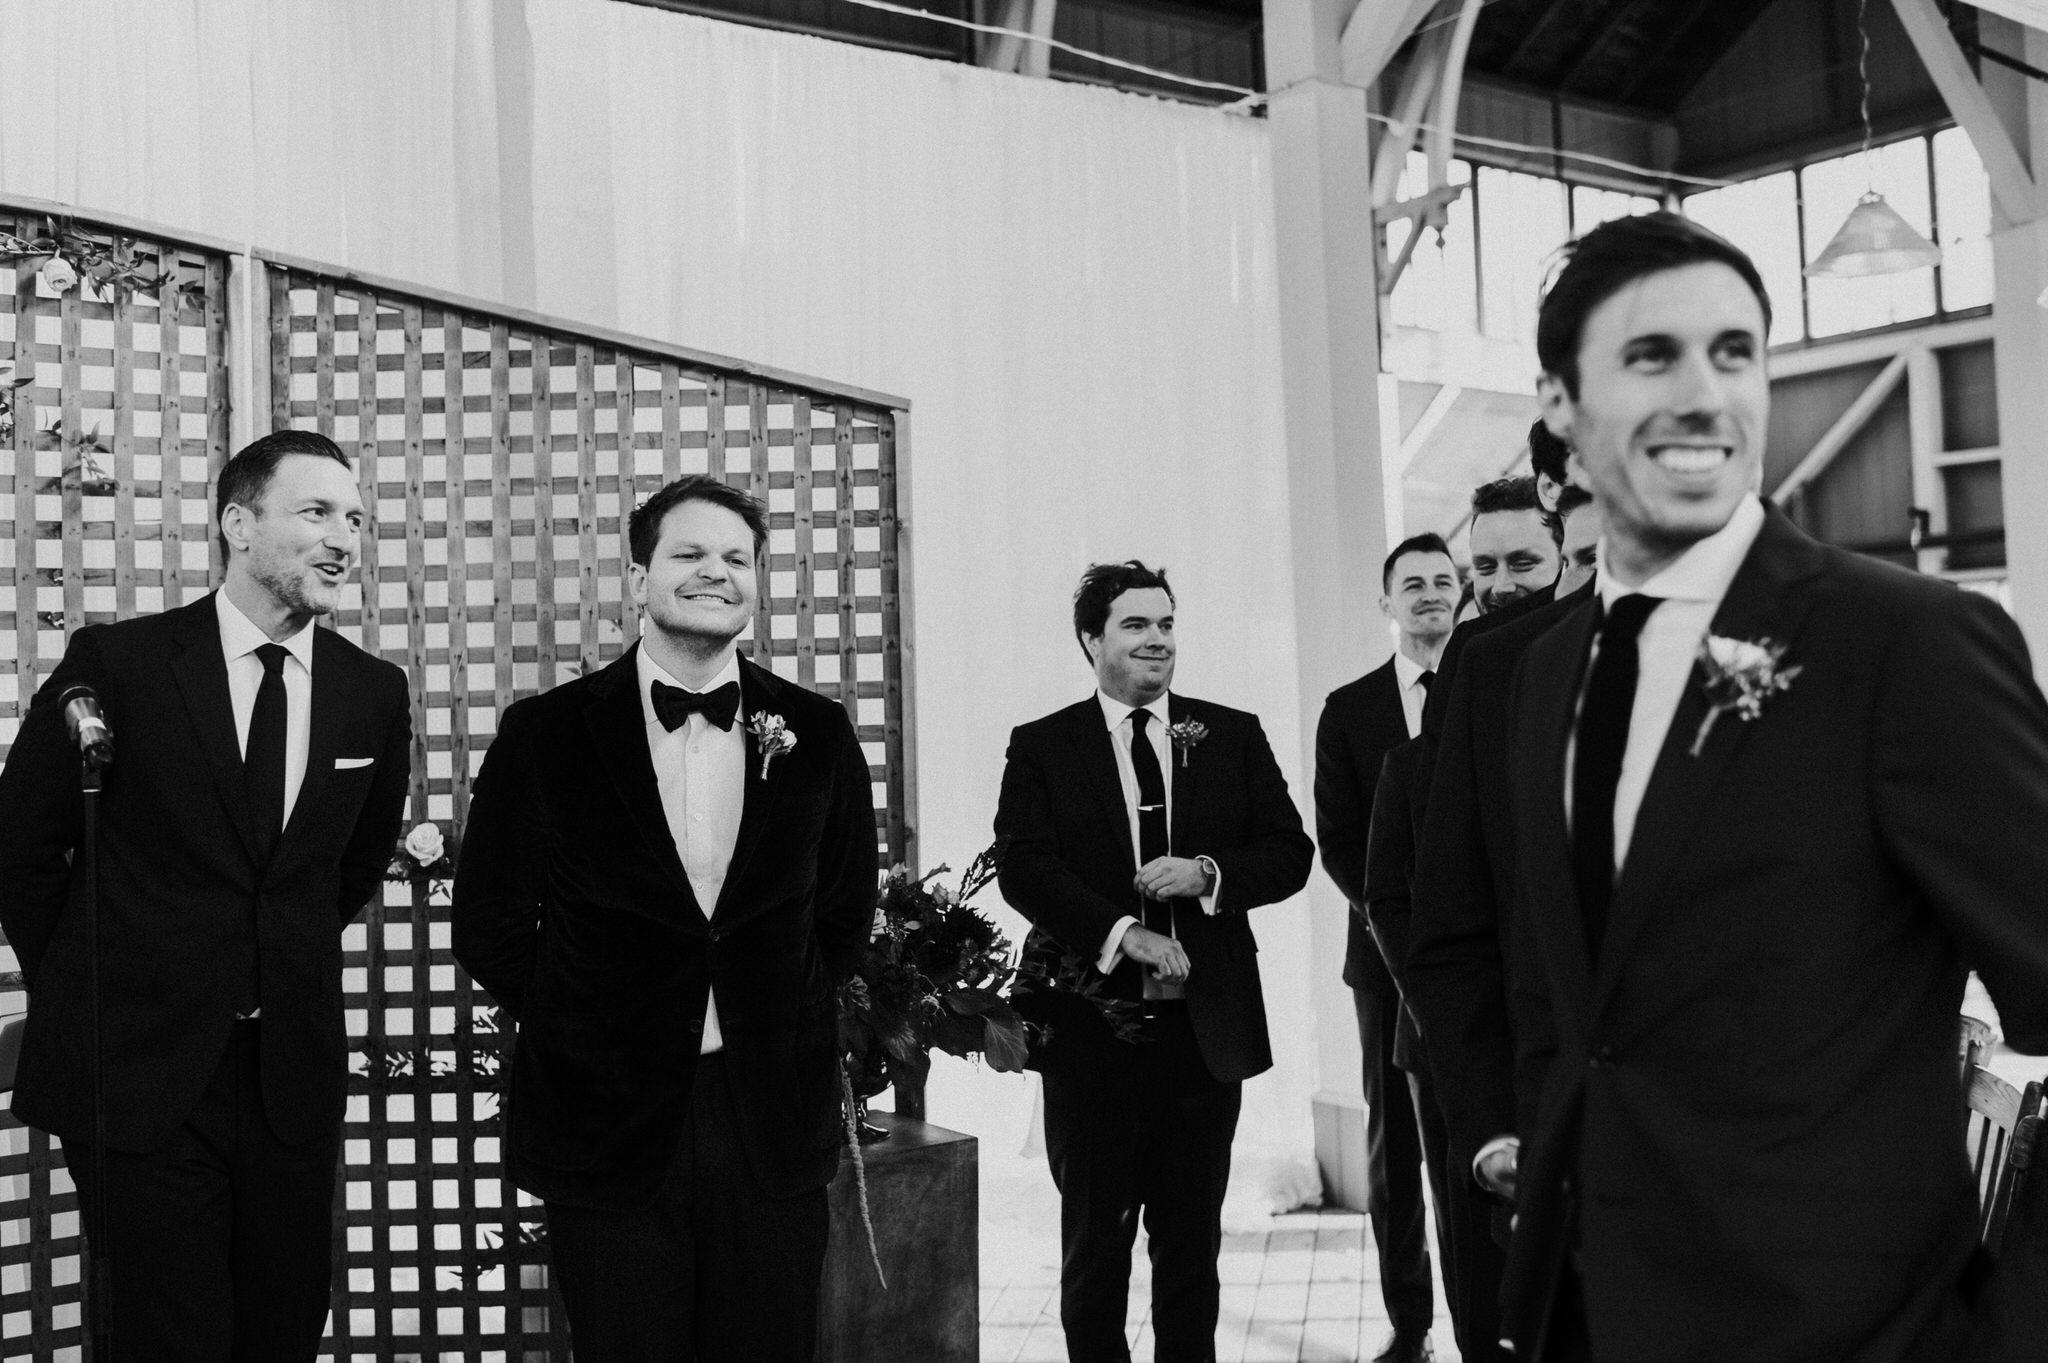 scarletoneillphotography_weddingphotography_prince edward county weddings107.JPG